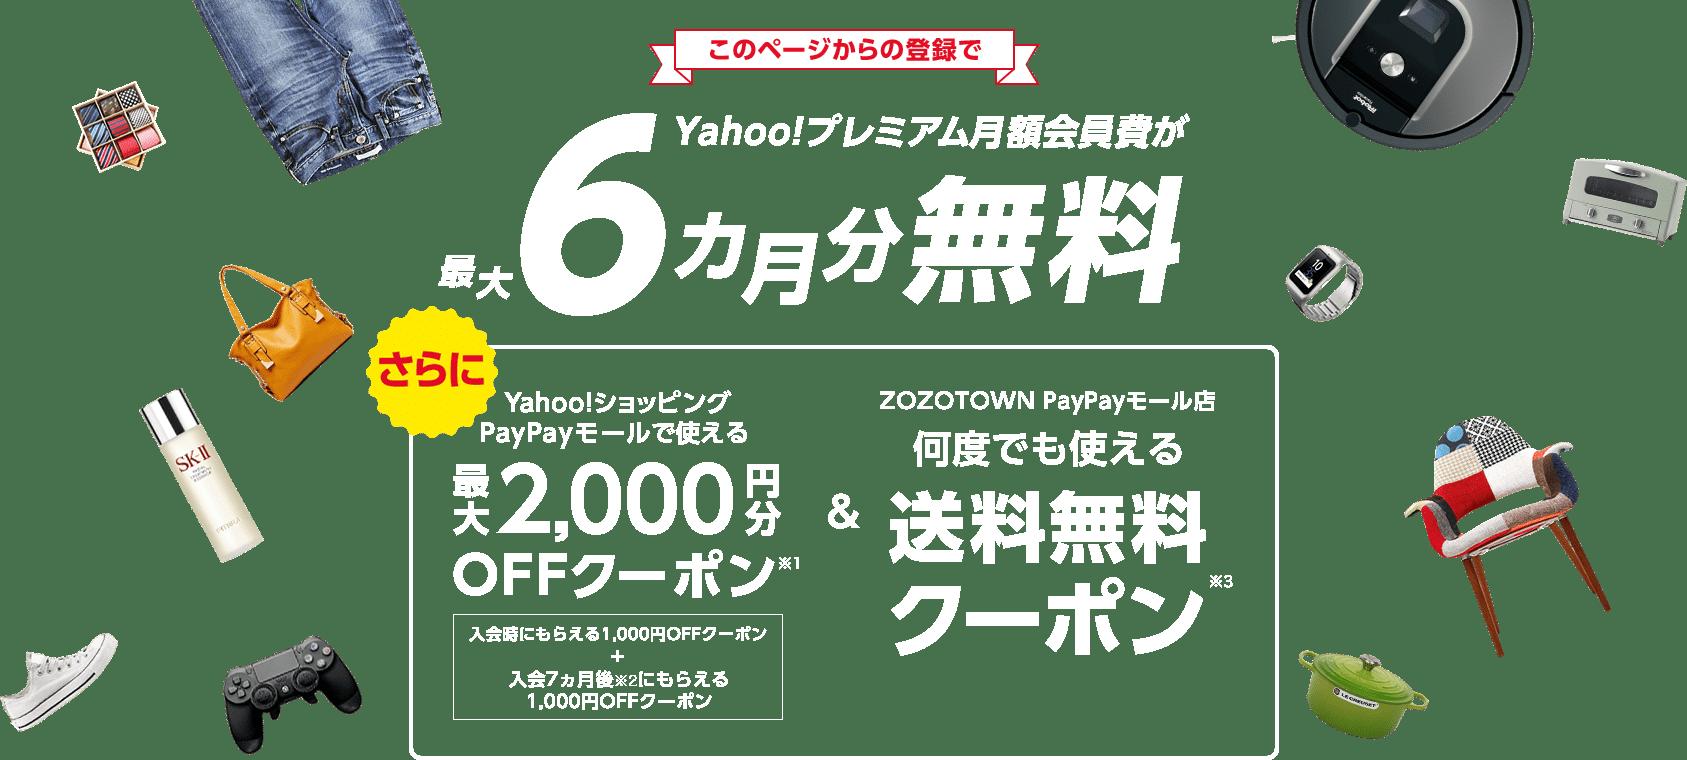 Yahoo!プレミアム月額会員費が最大6カ月分無料、さらにYahoo!ショッピングで会員登録後にすぐ使える最大2,000円クーポンをプレゼント!